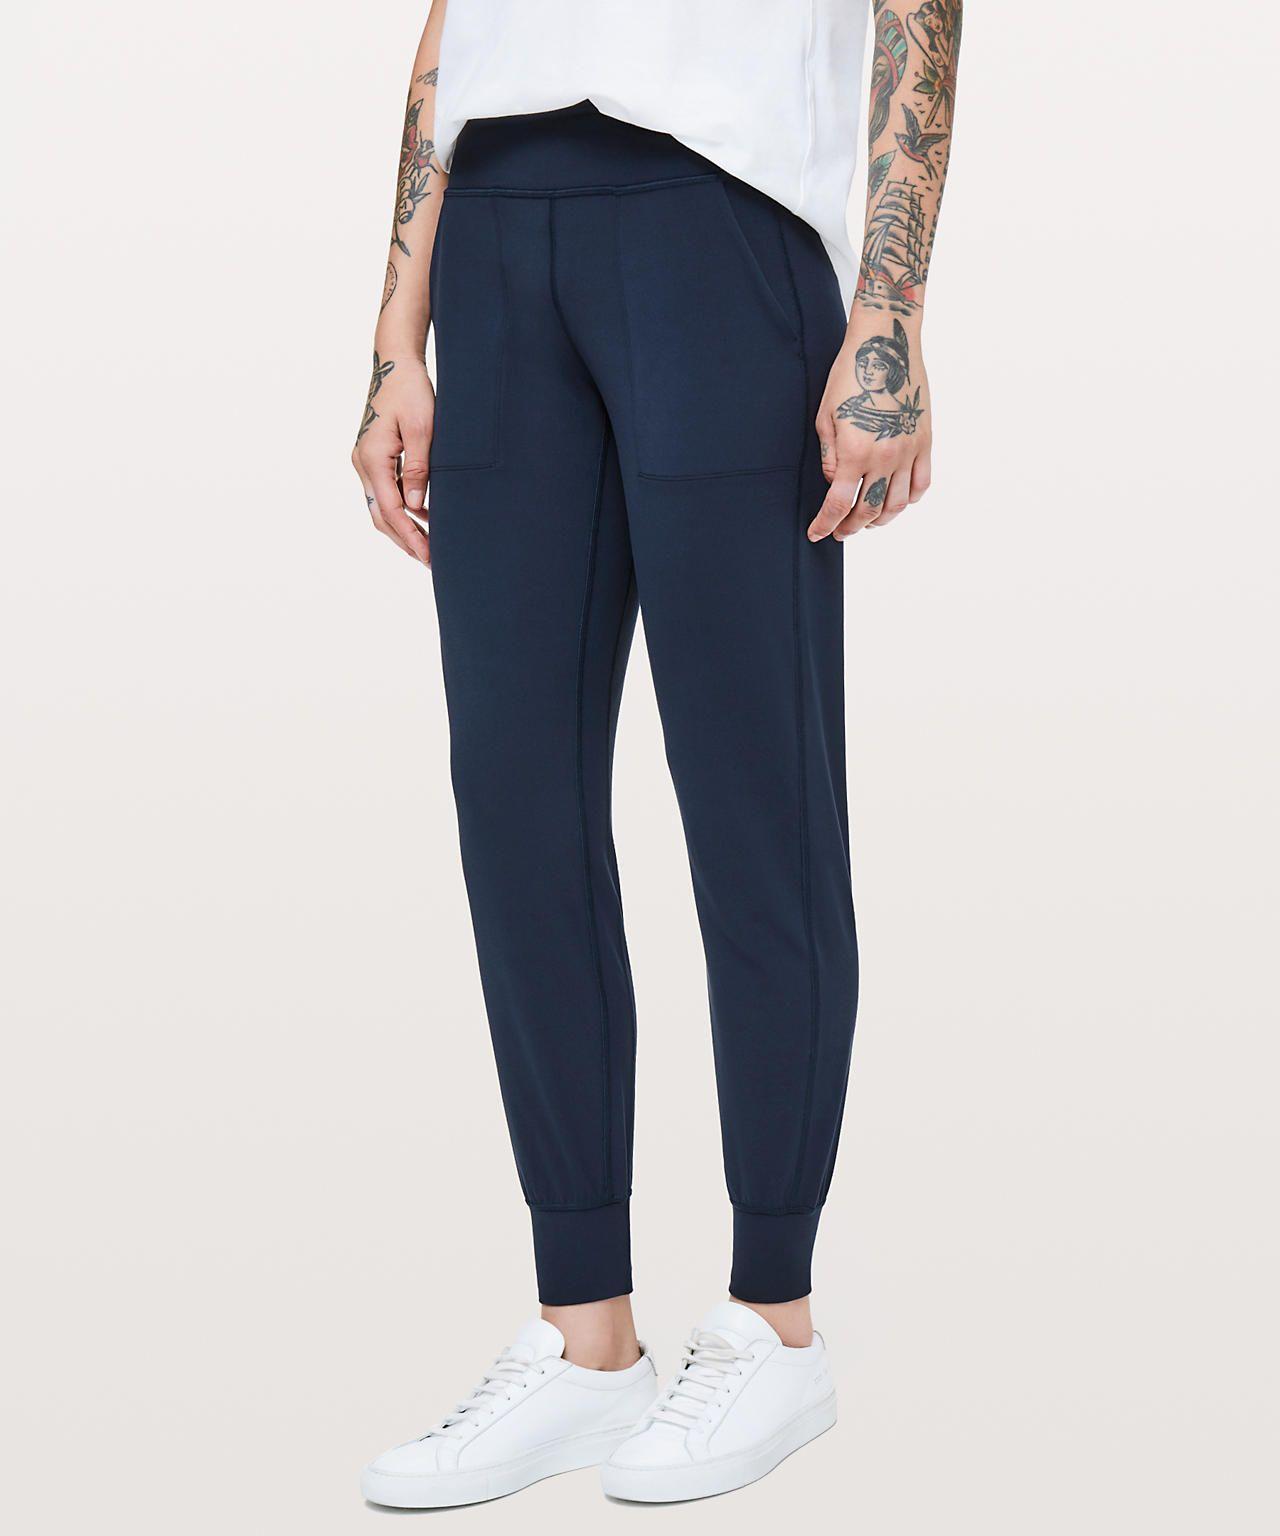 Lululemon align jogger 28 pants for women yoga pants